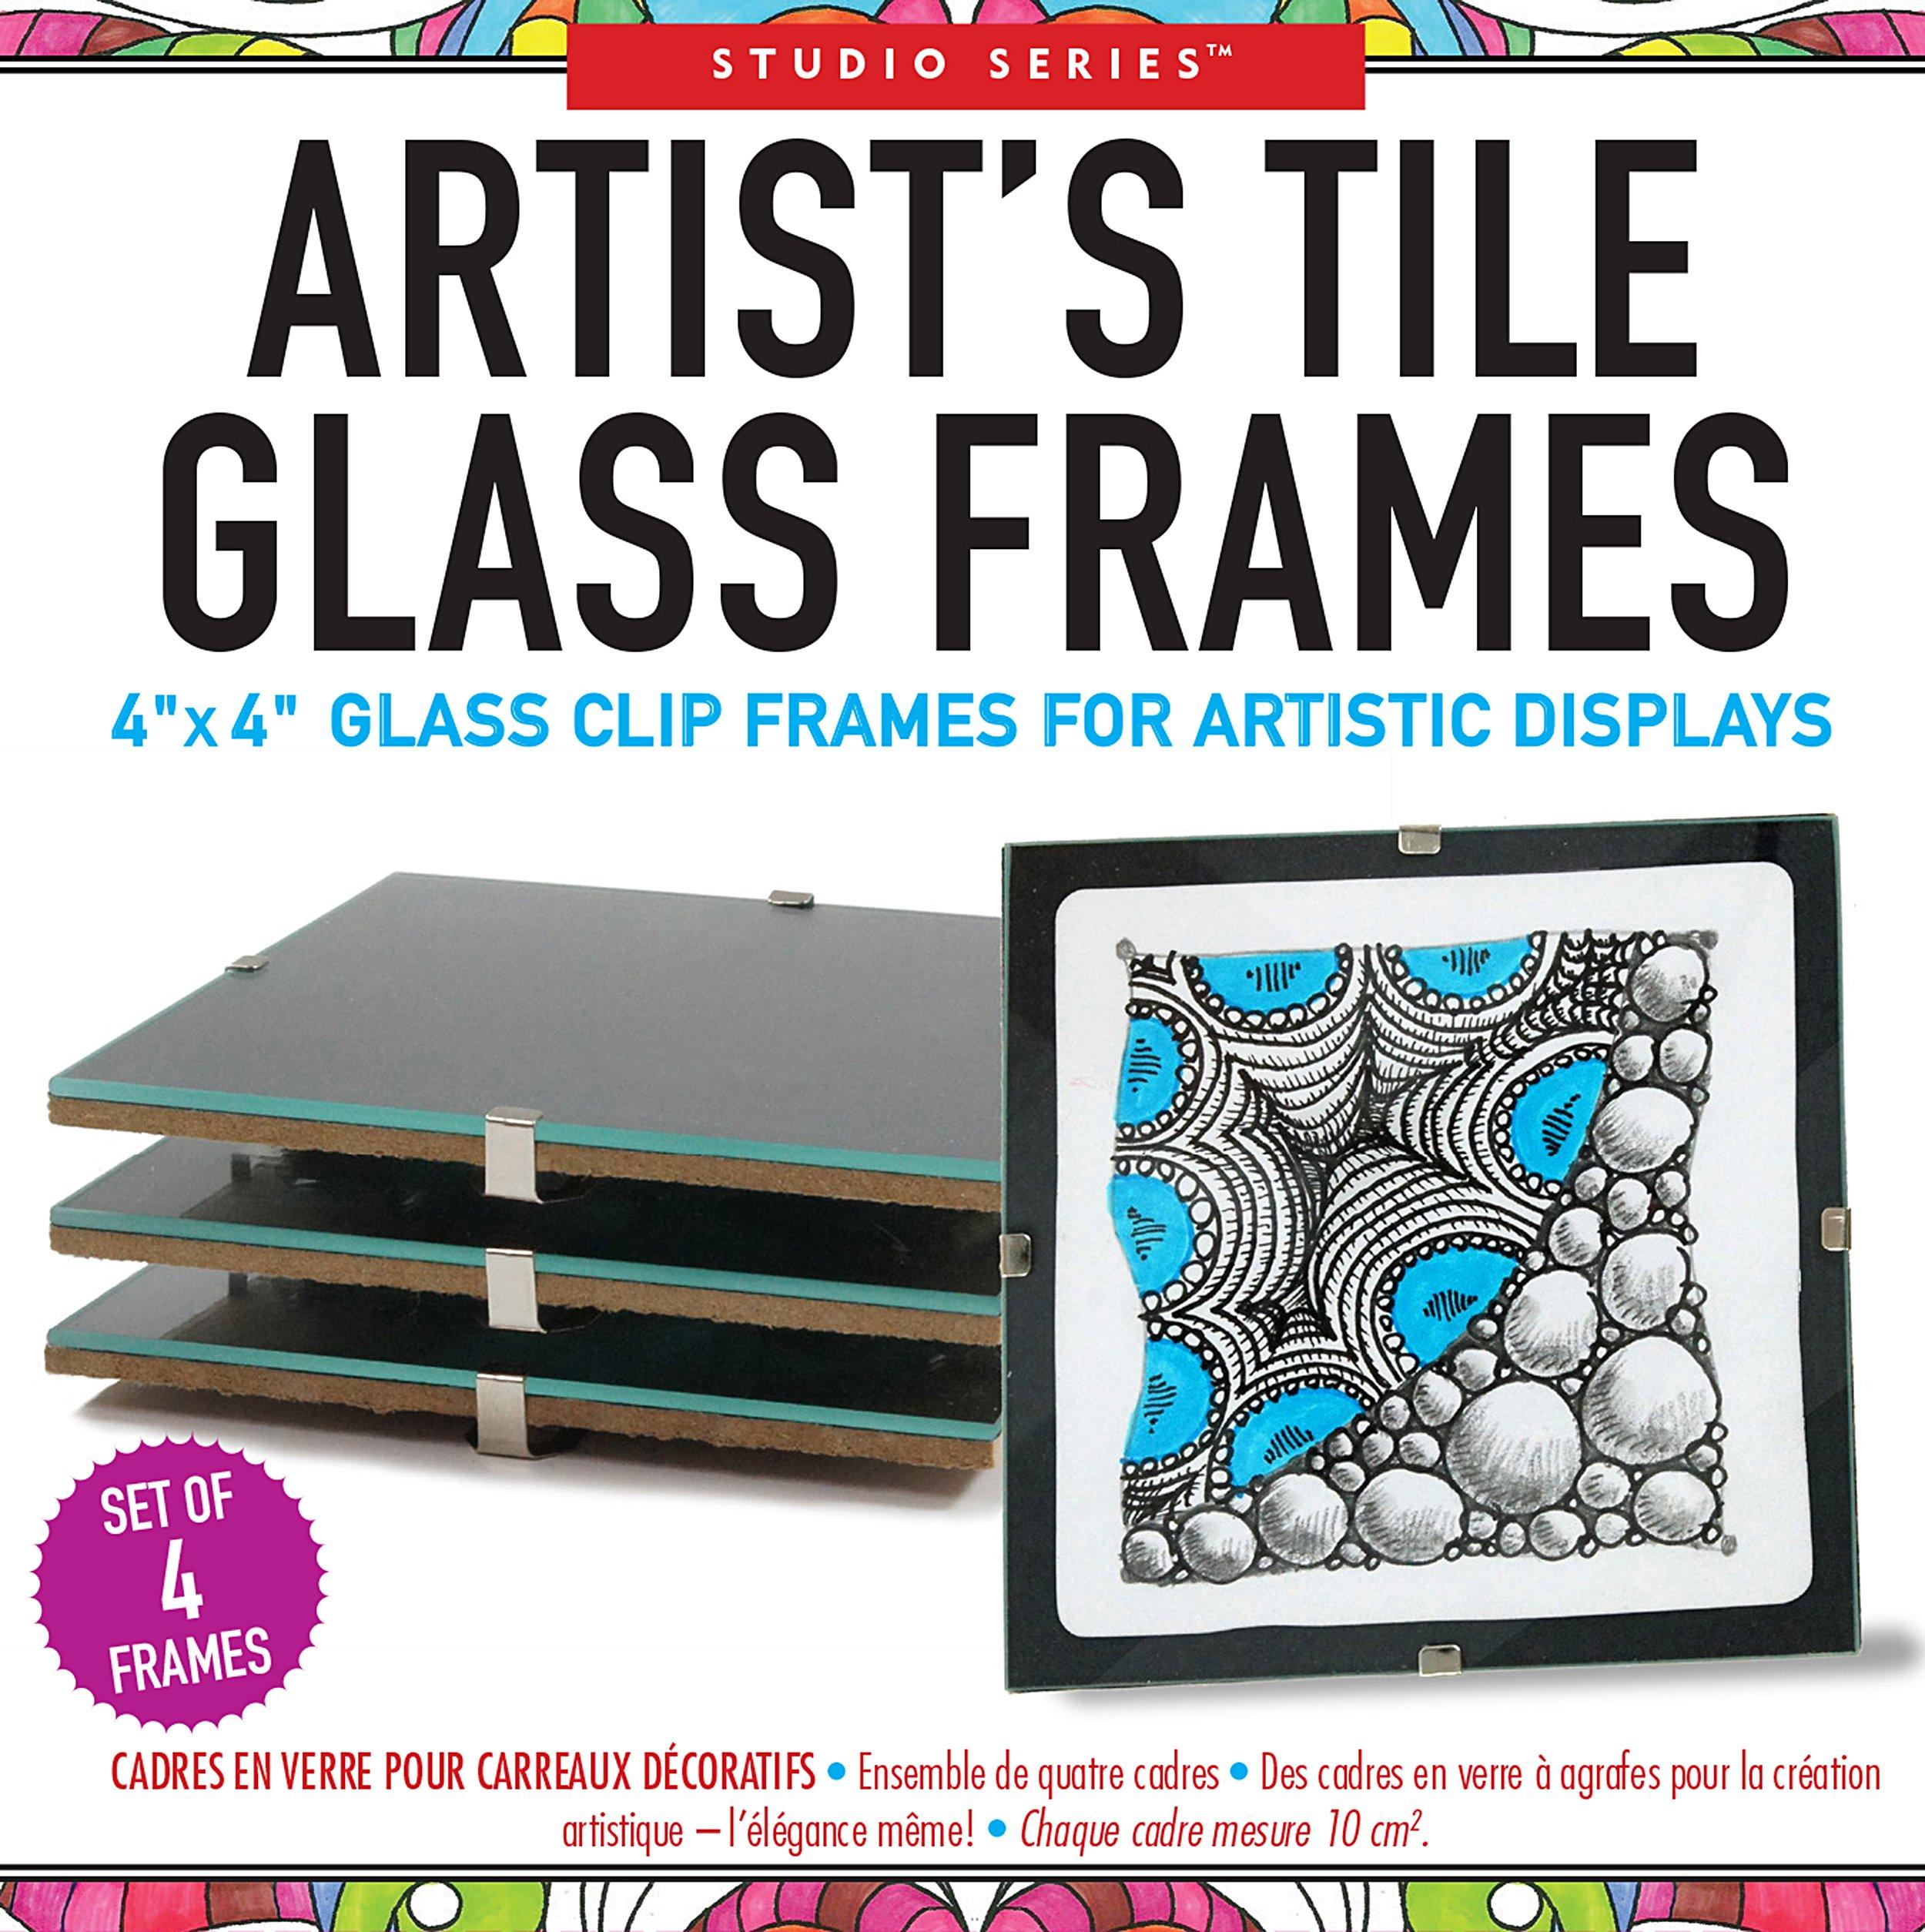 Studio Artists Frames frames miniature product image